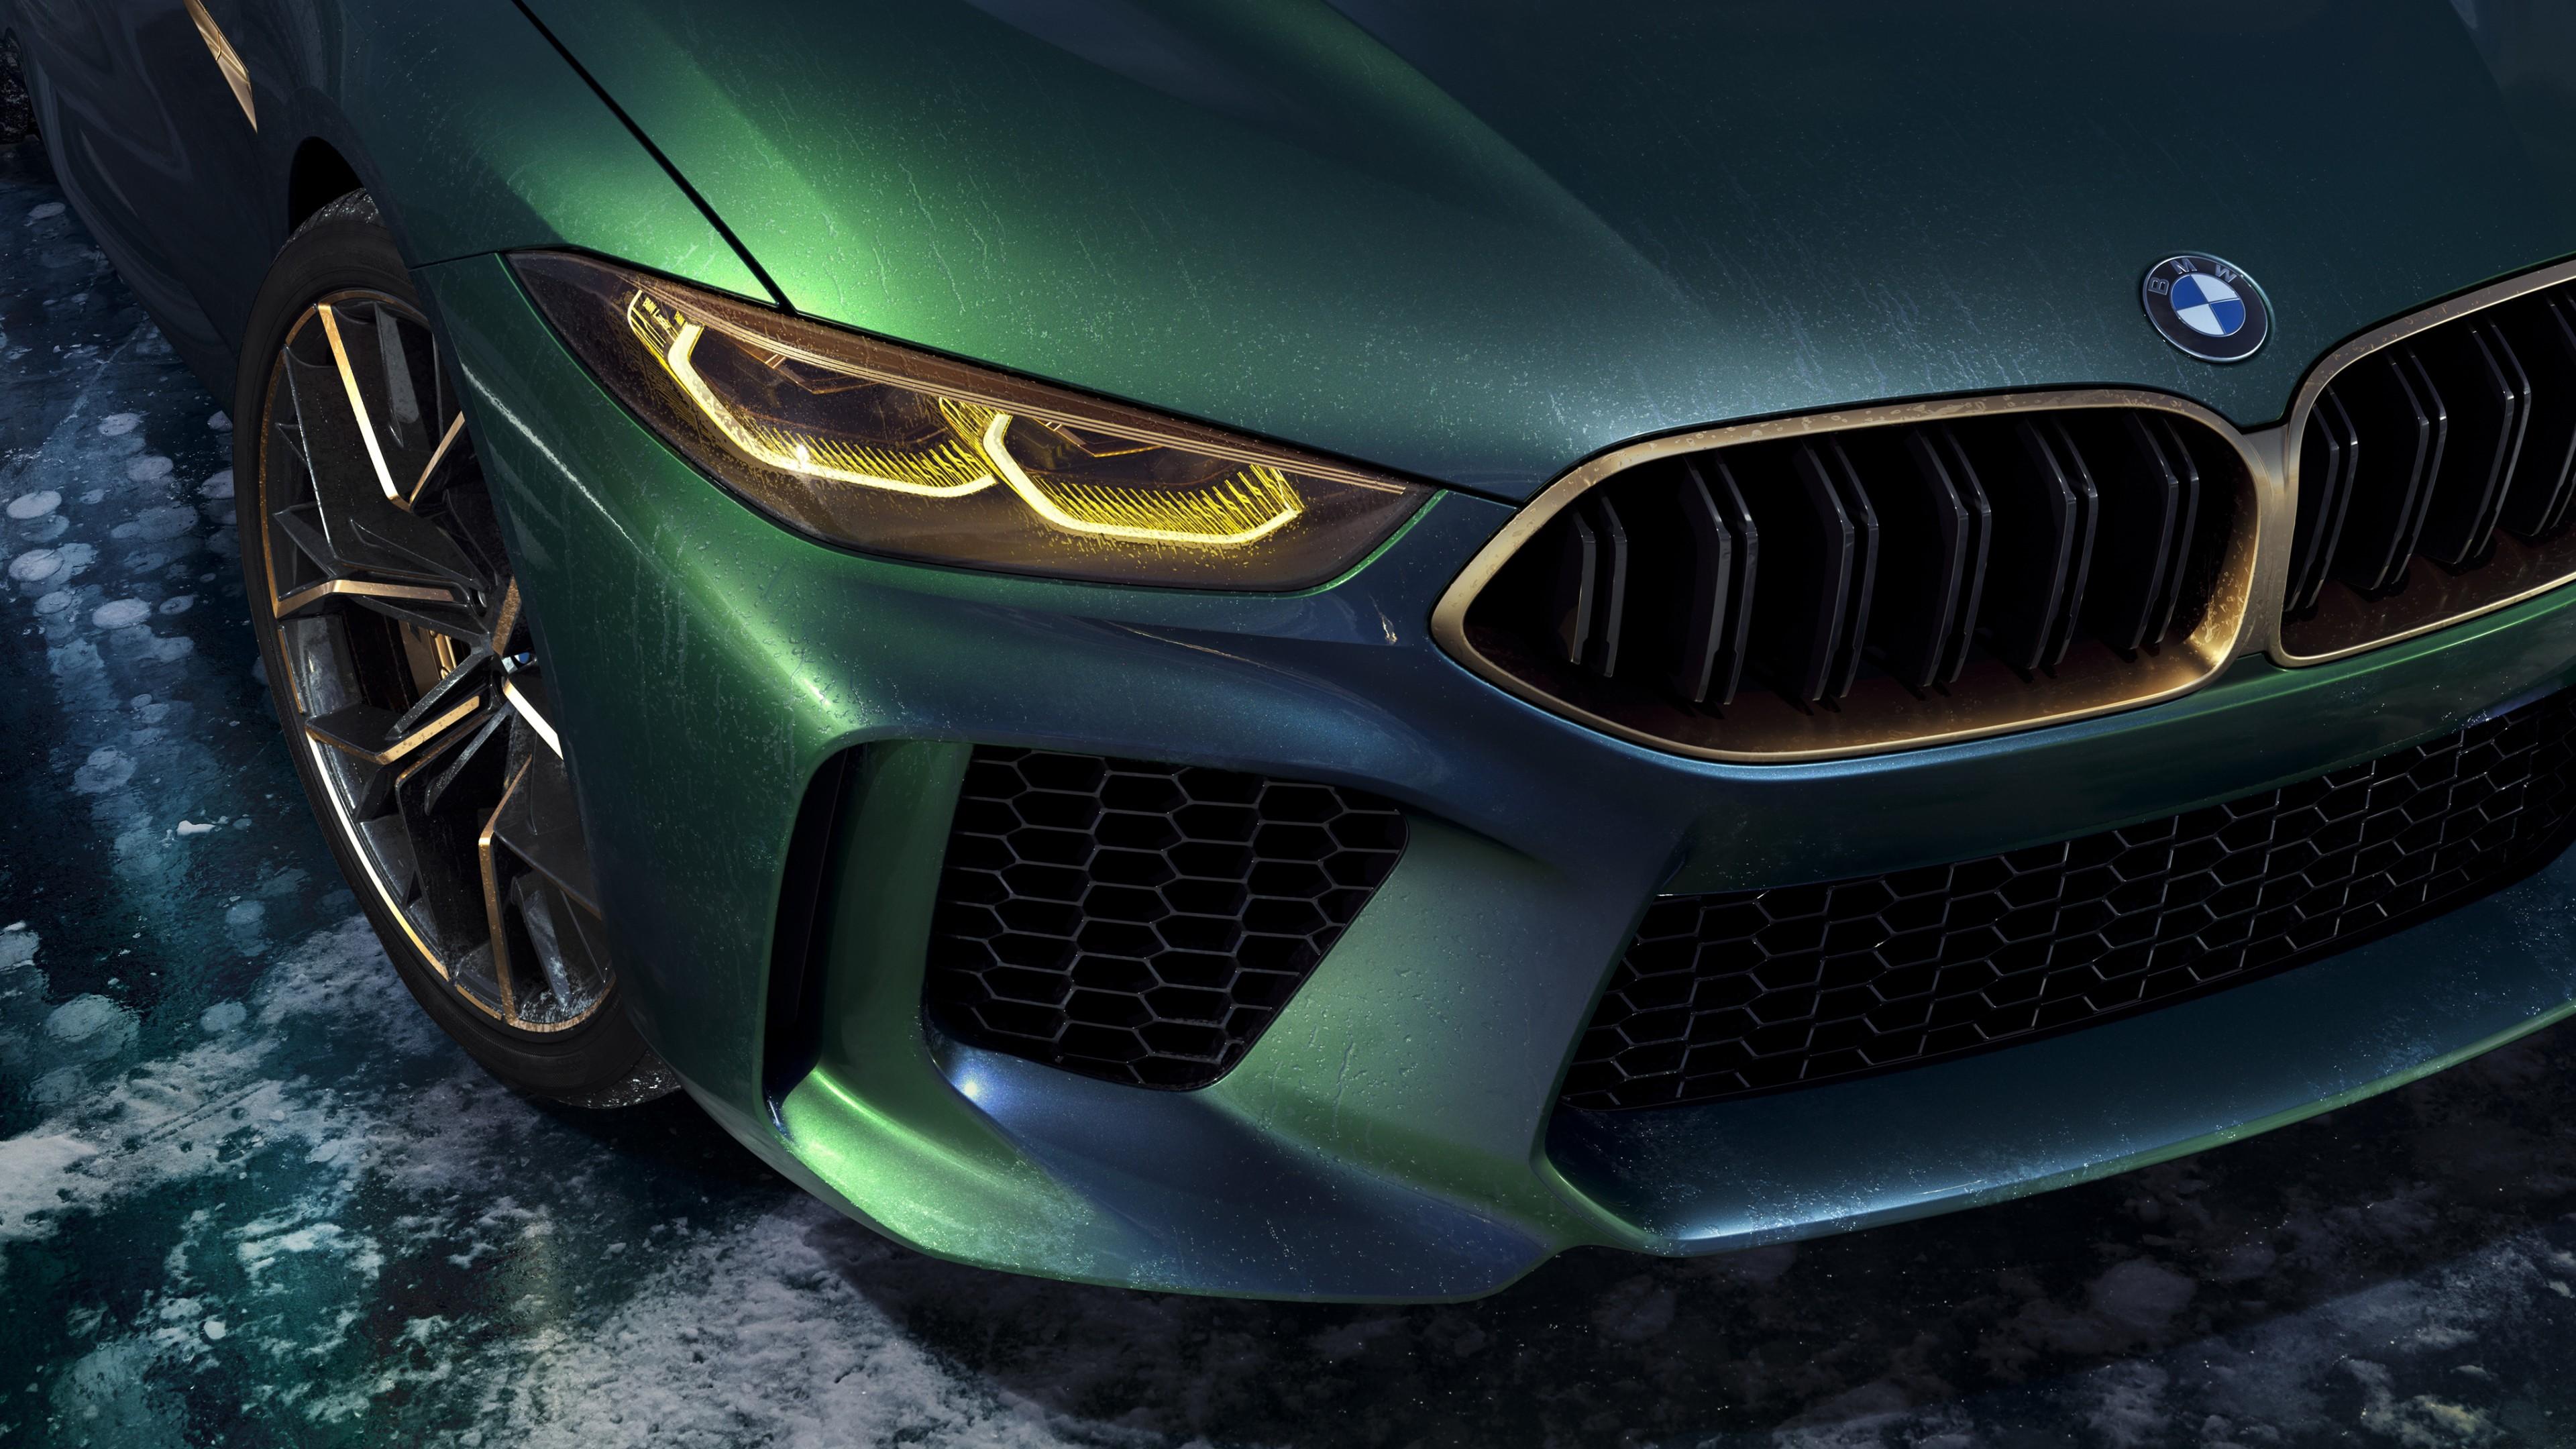 2018 BMW Concept M8 Gran Coupe 4K Wallpaper | HD Car ...